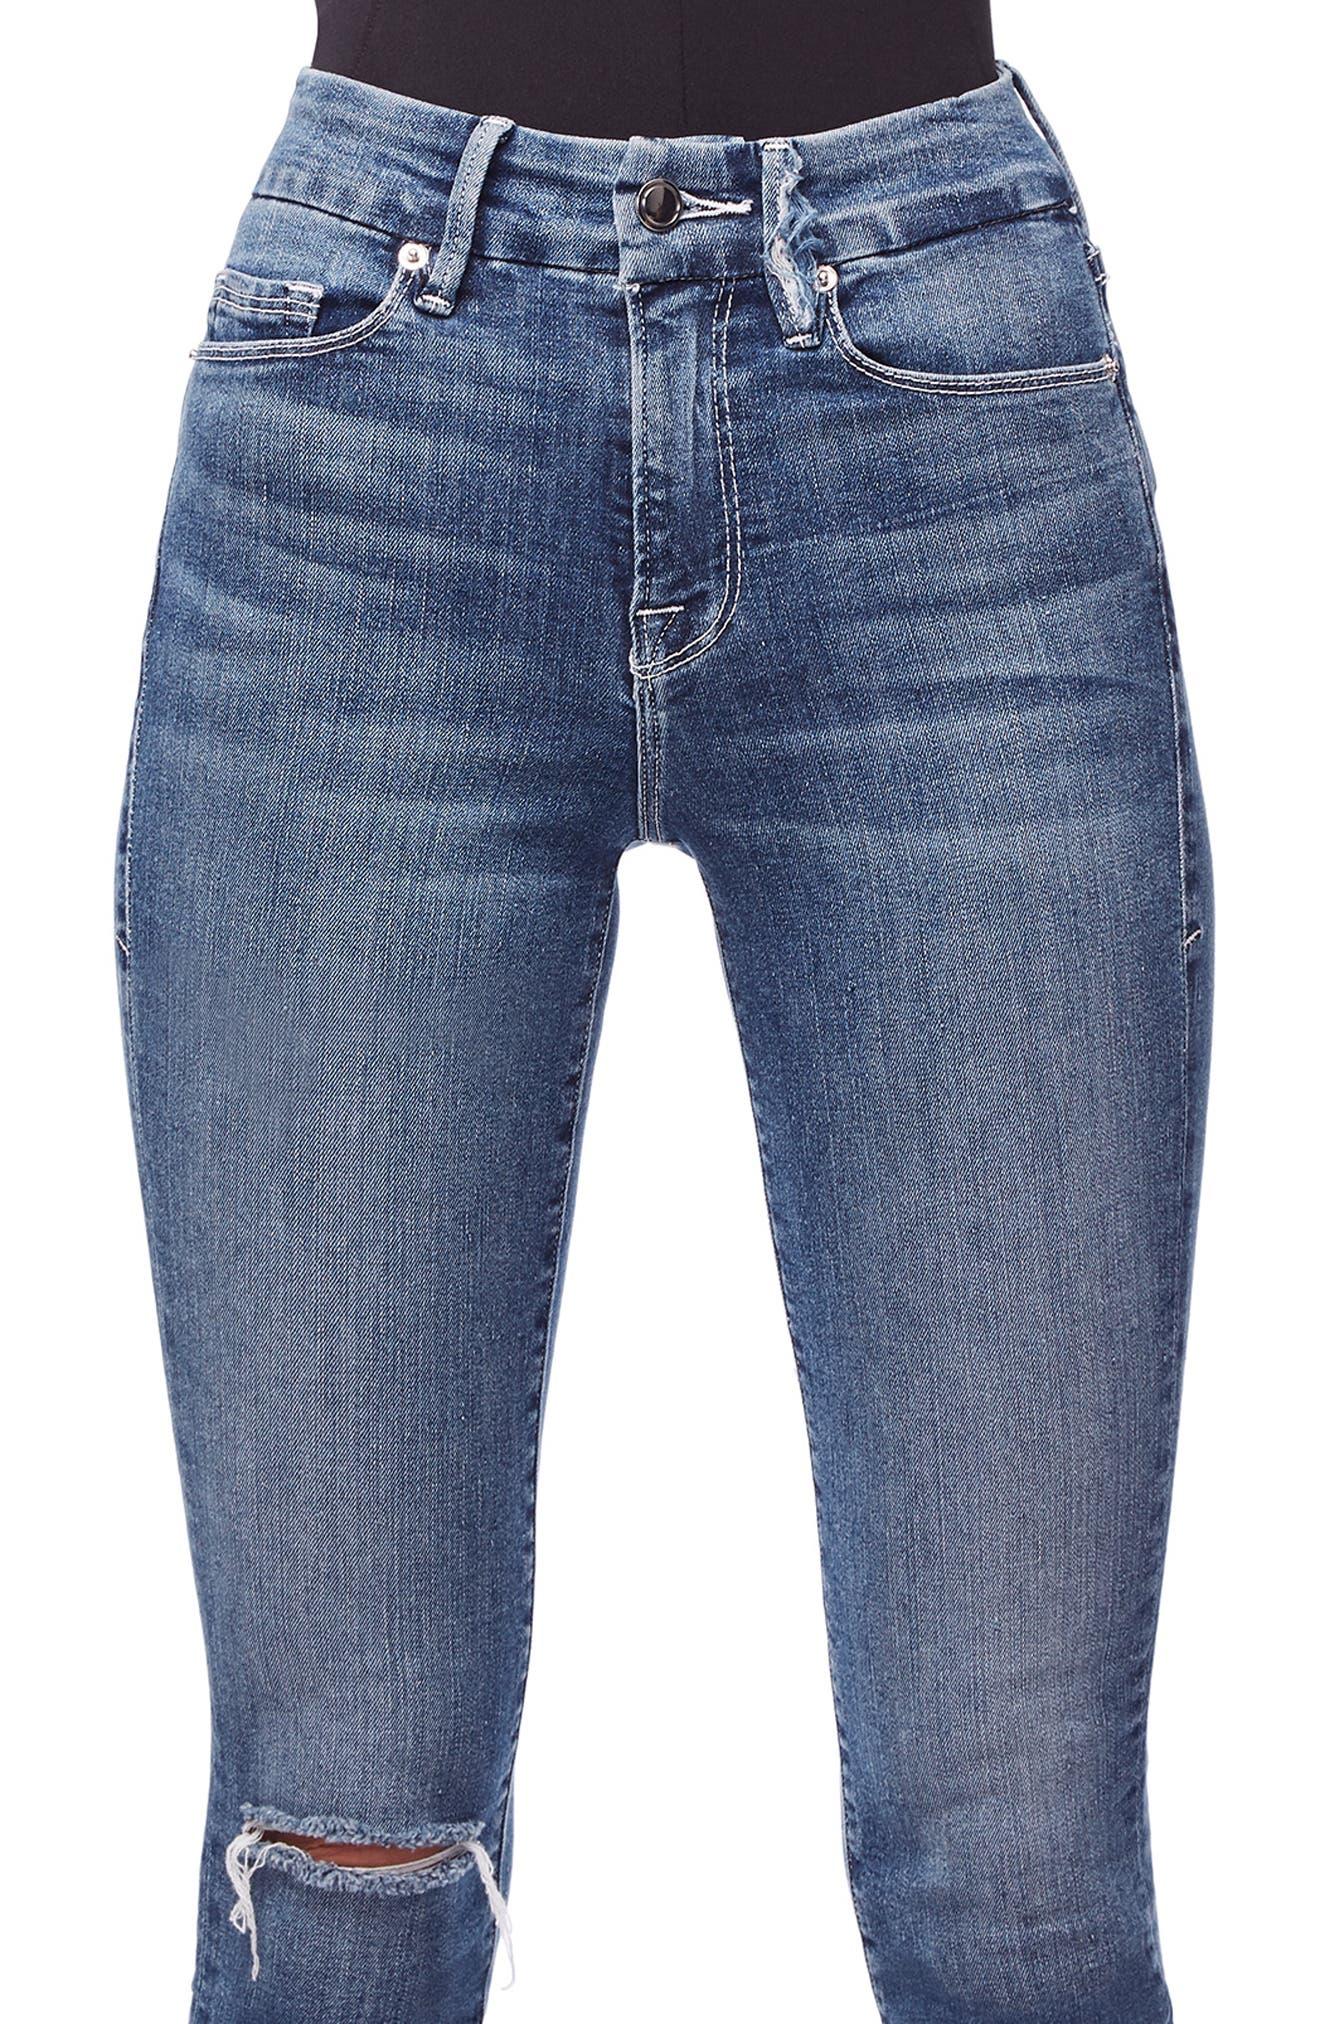 GOOD AMERICAN, Good Legs High Waist Skinny Jeans, Alternate thumbnail 6, color, BLUE186